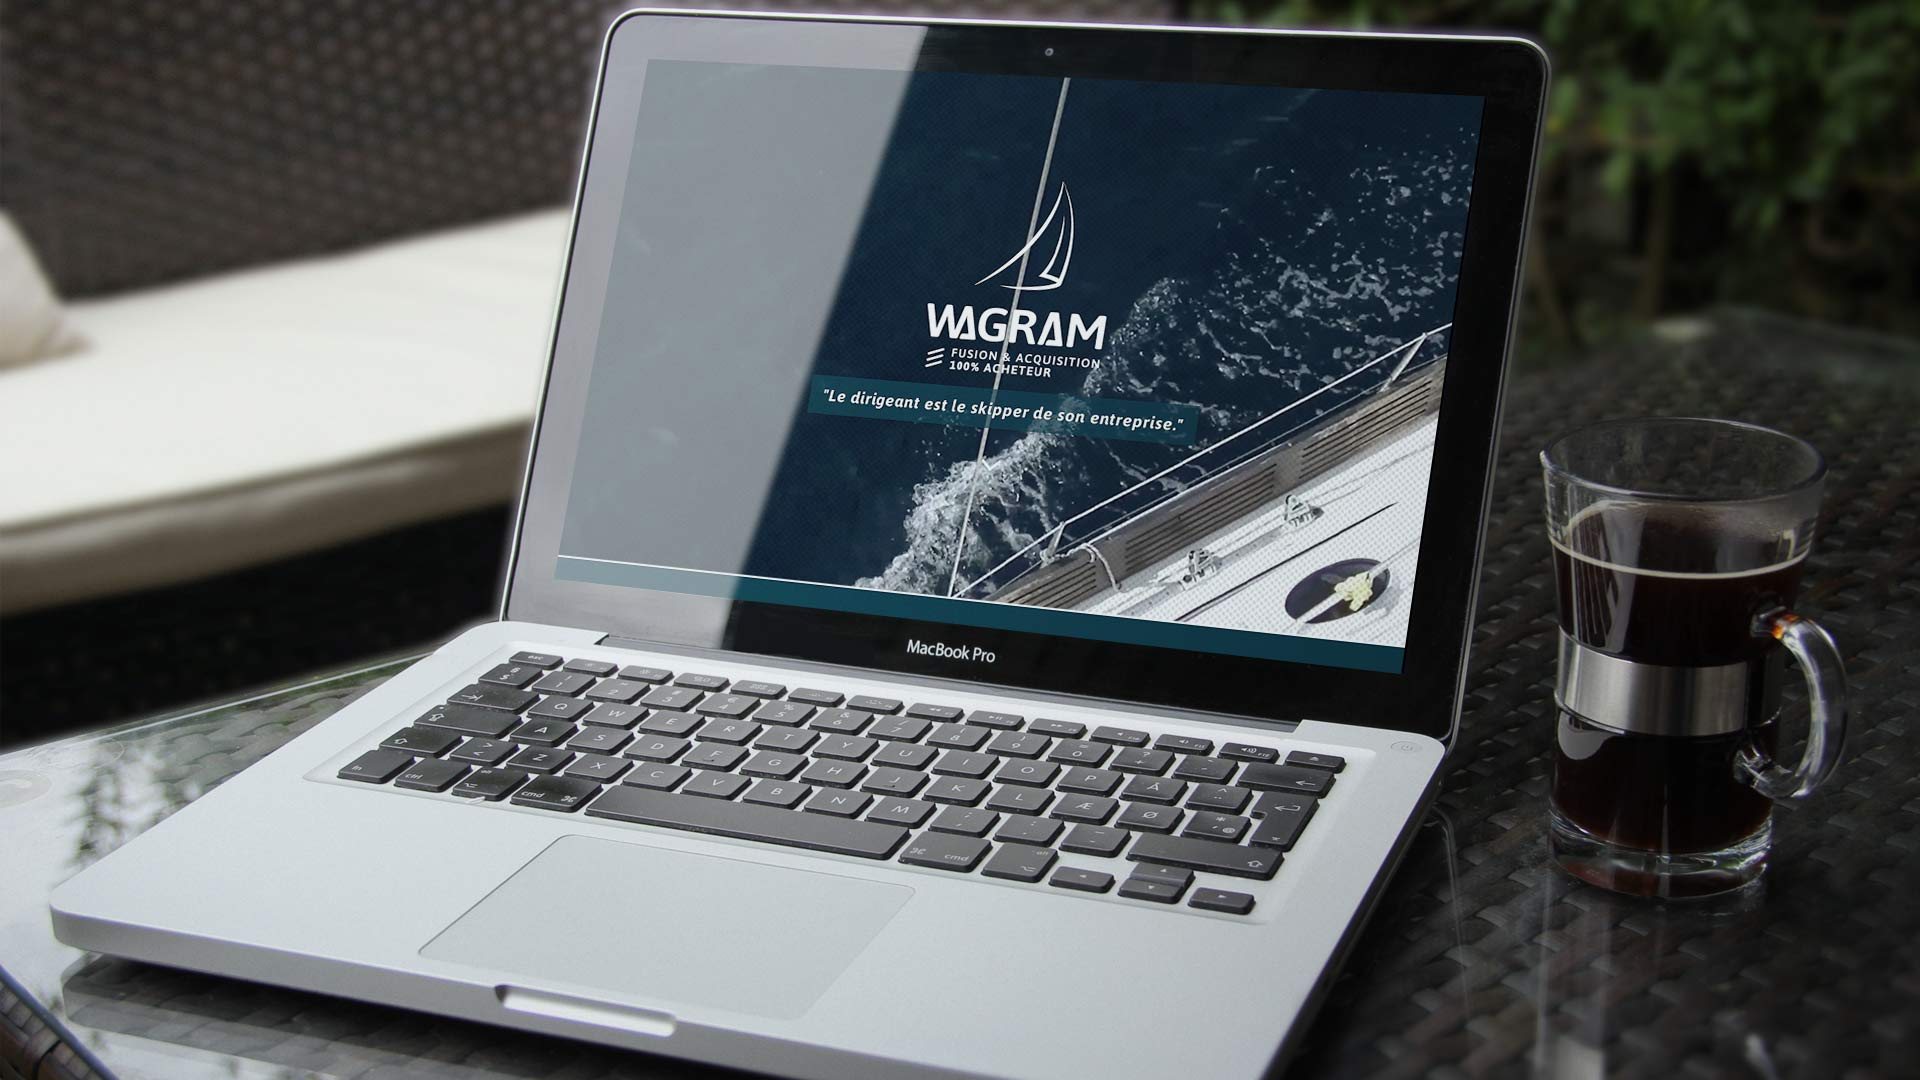 wagram site internet